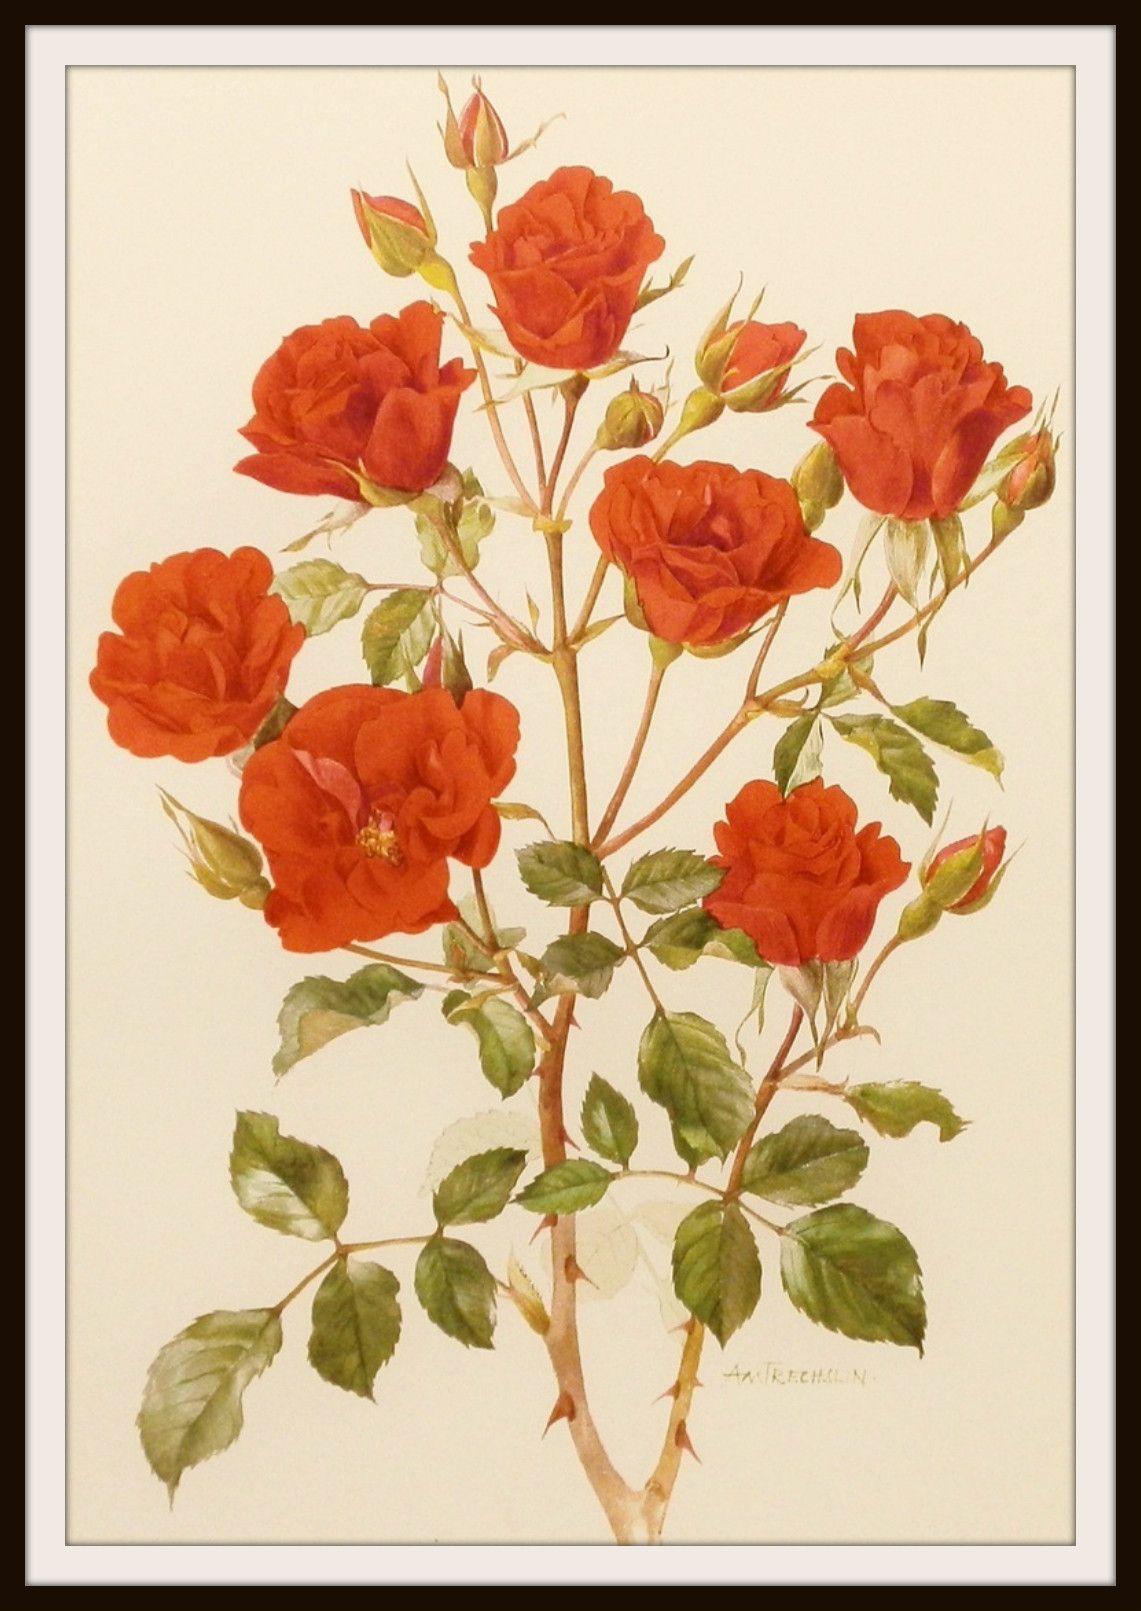 Vintage Botanical Image Art Print   Pinterest   Art images, Printing ...